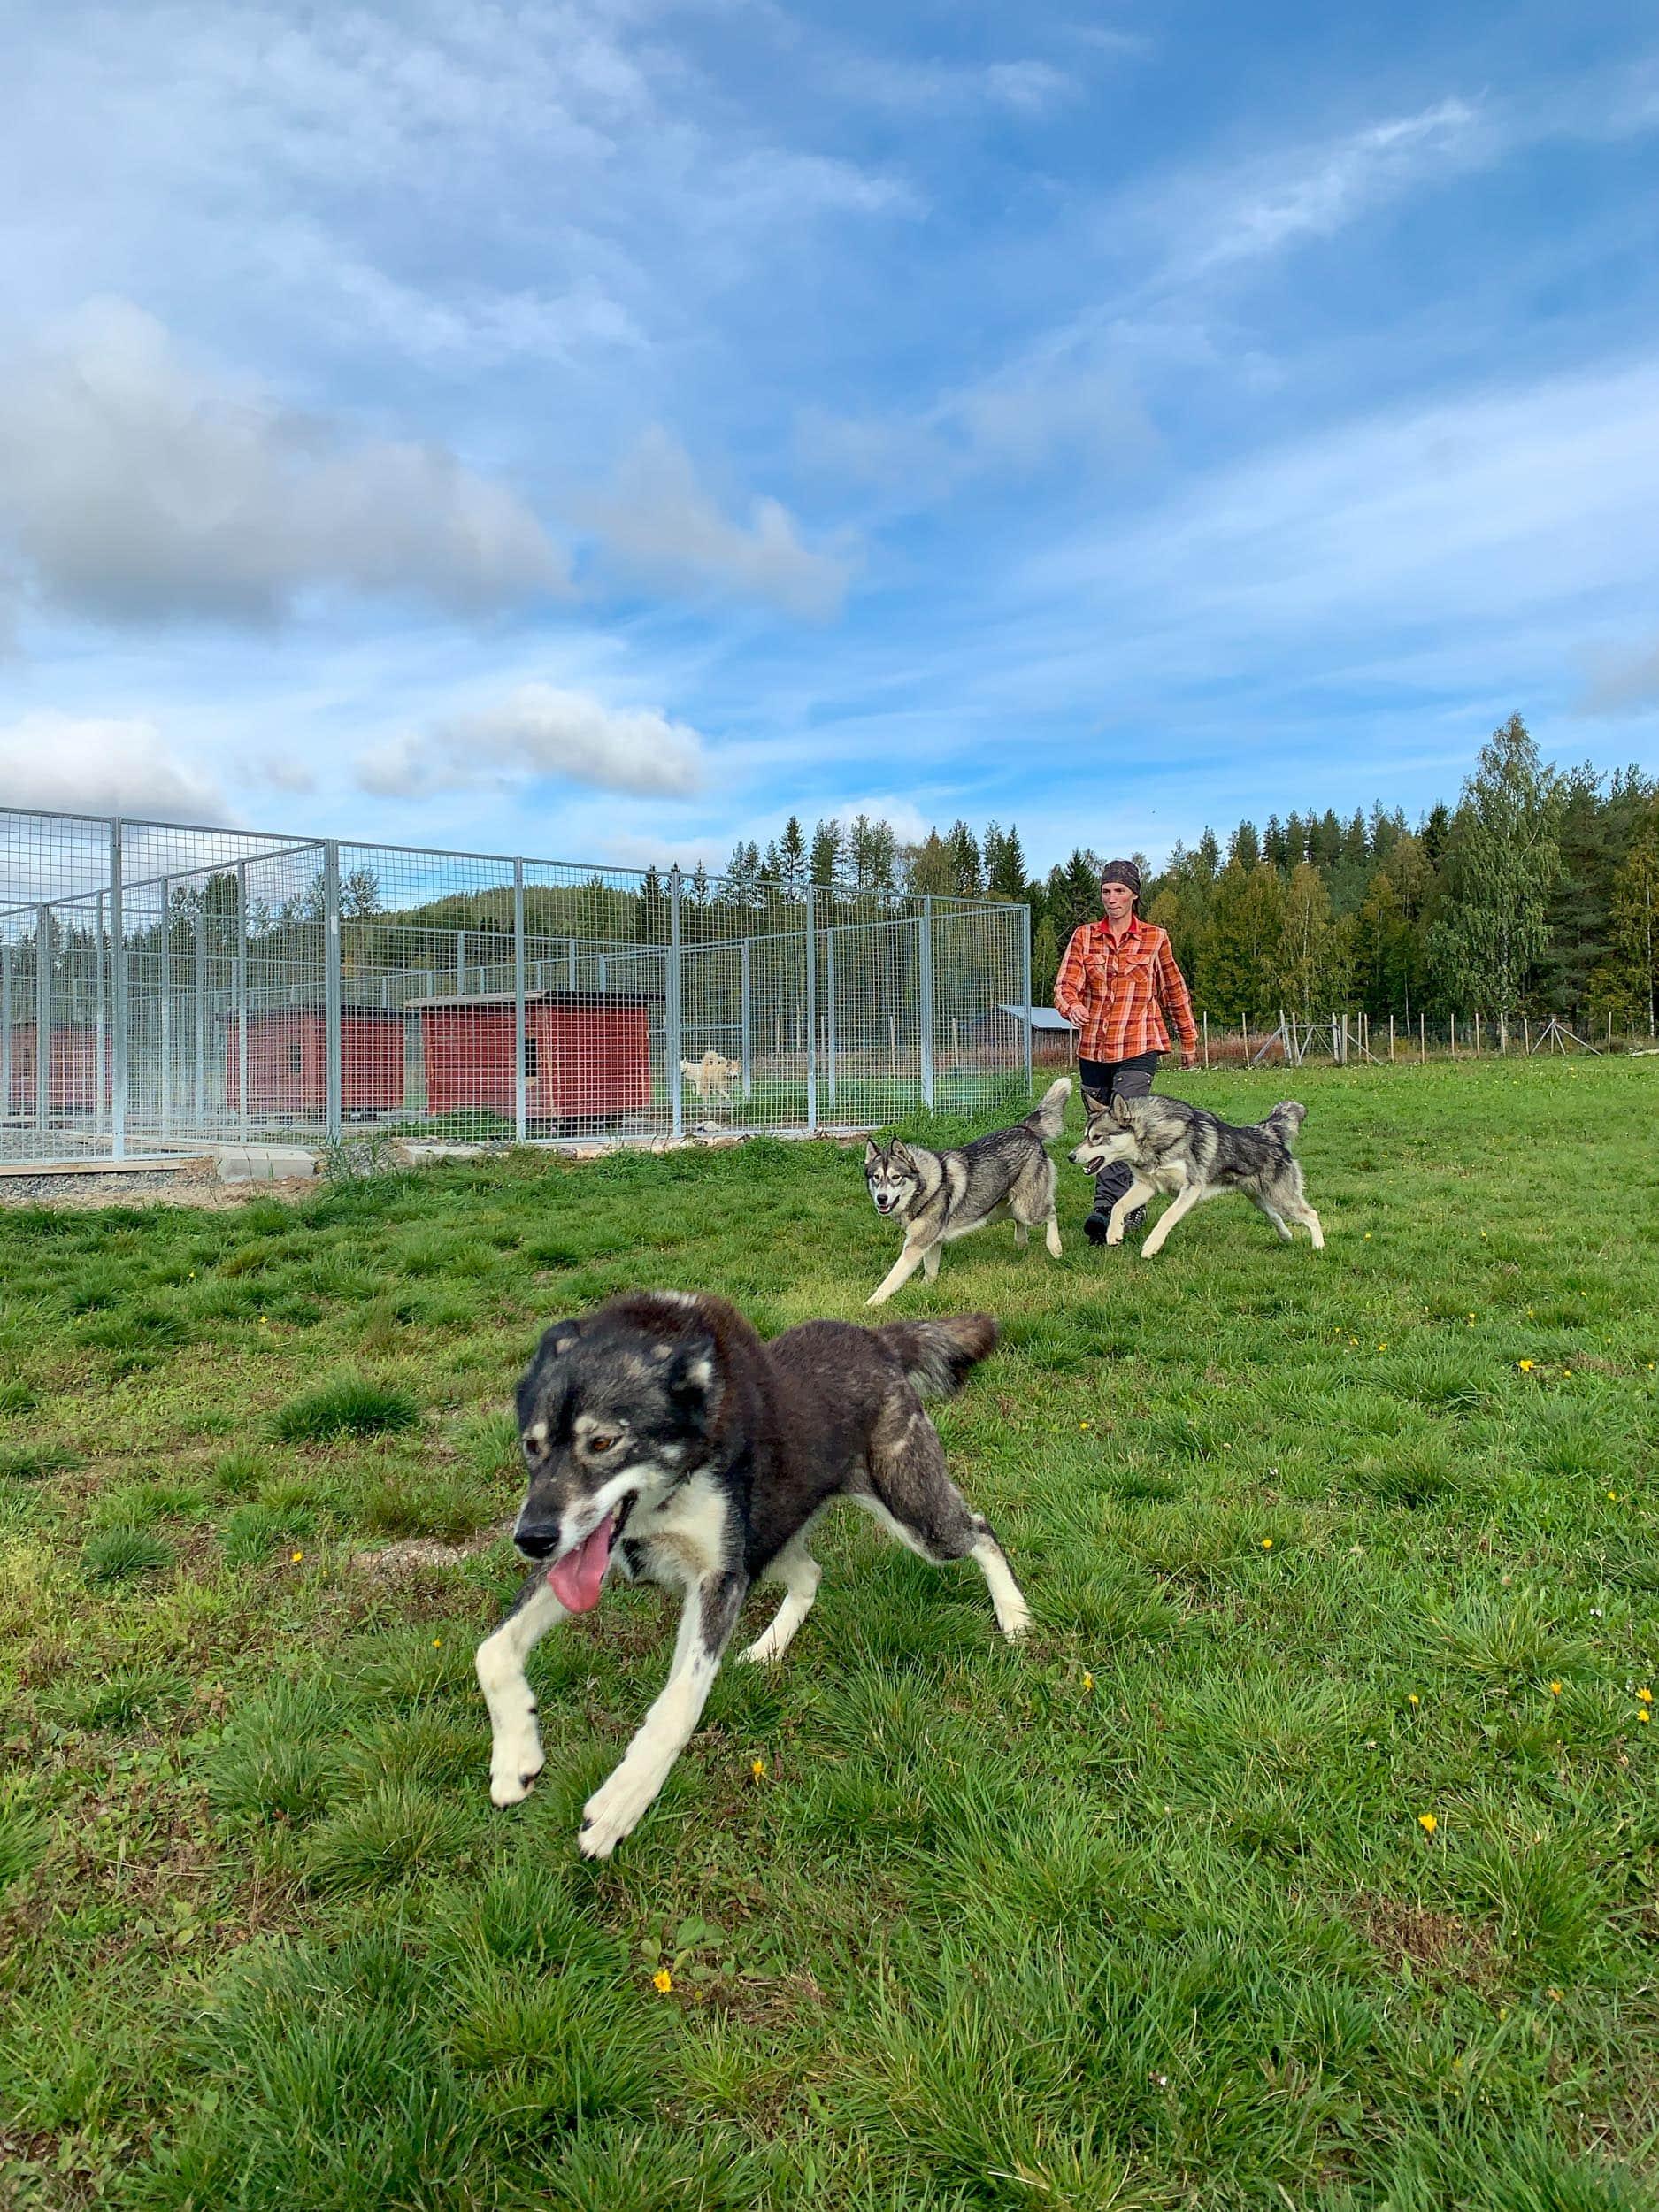 Spruce Island Husky is located in Vasterbotten, Sweden